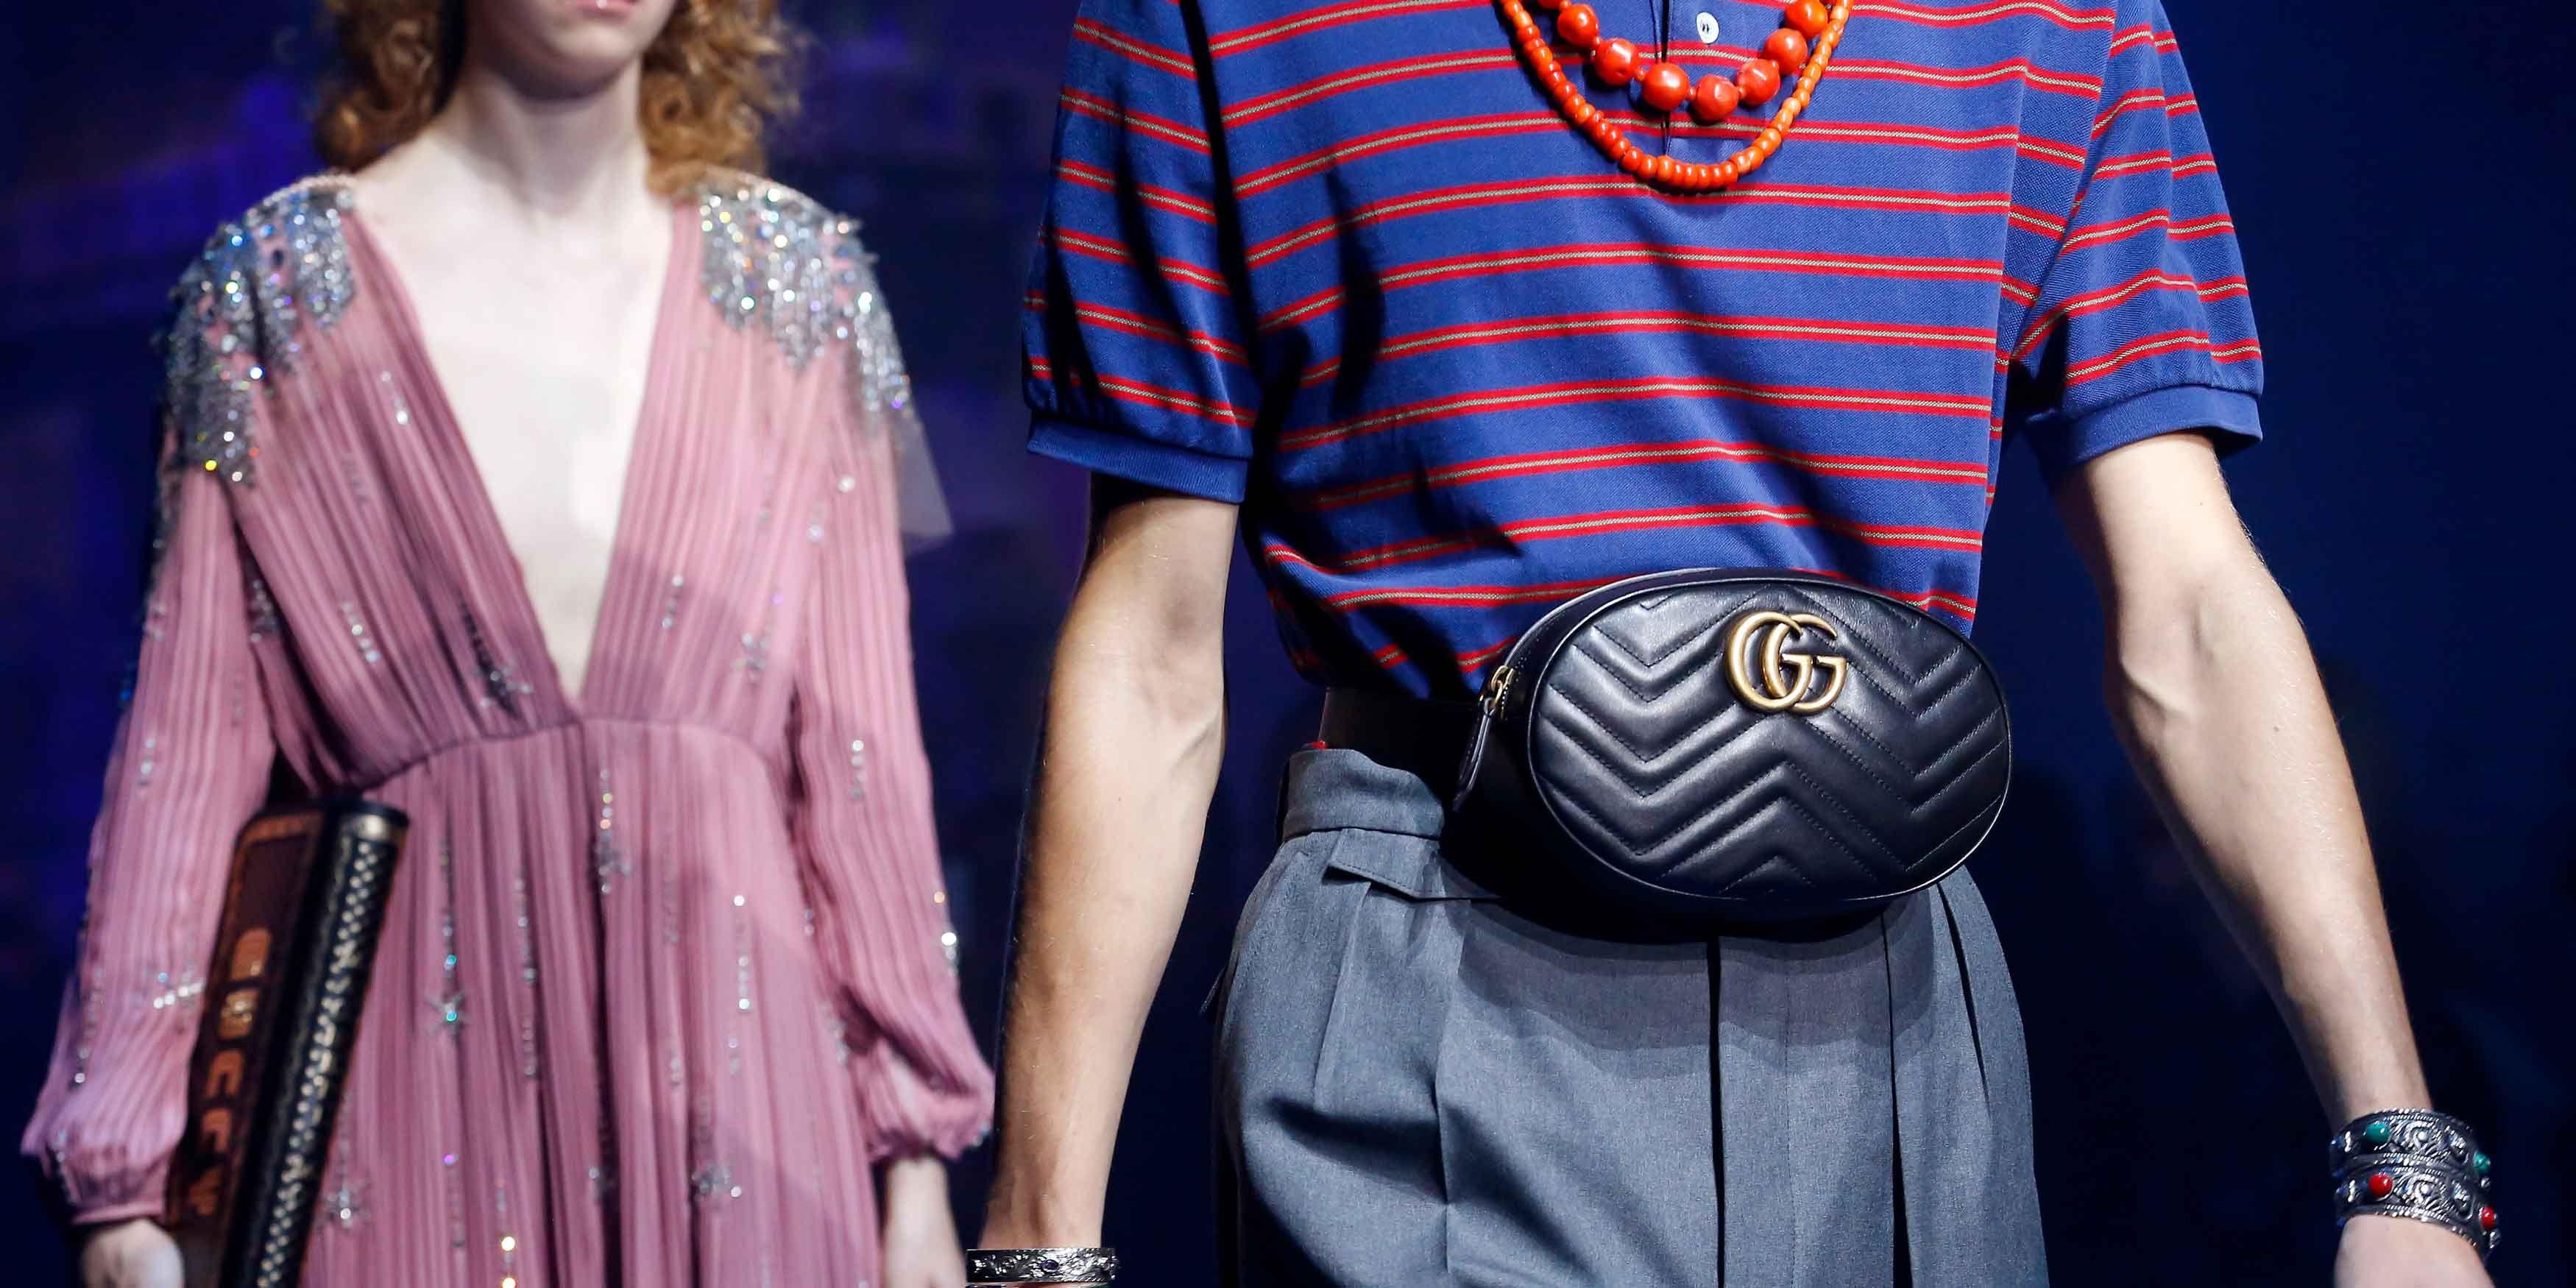 a3f545c7b833 Watch the Gucci Fall Winter 2018 Fashion Show Live